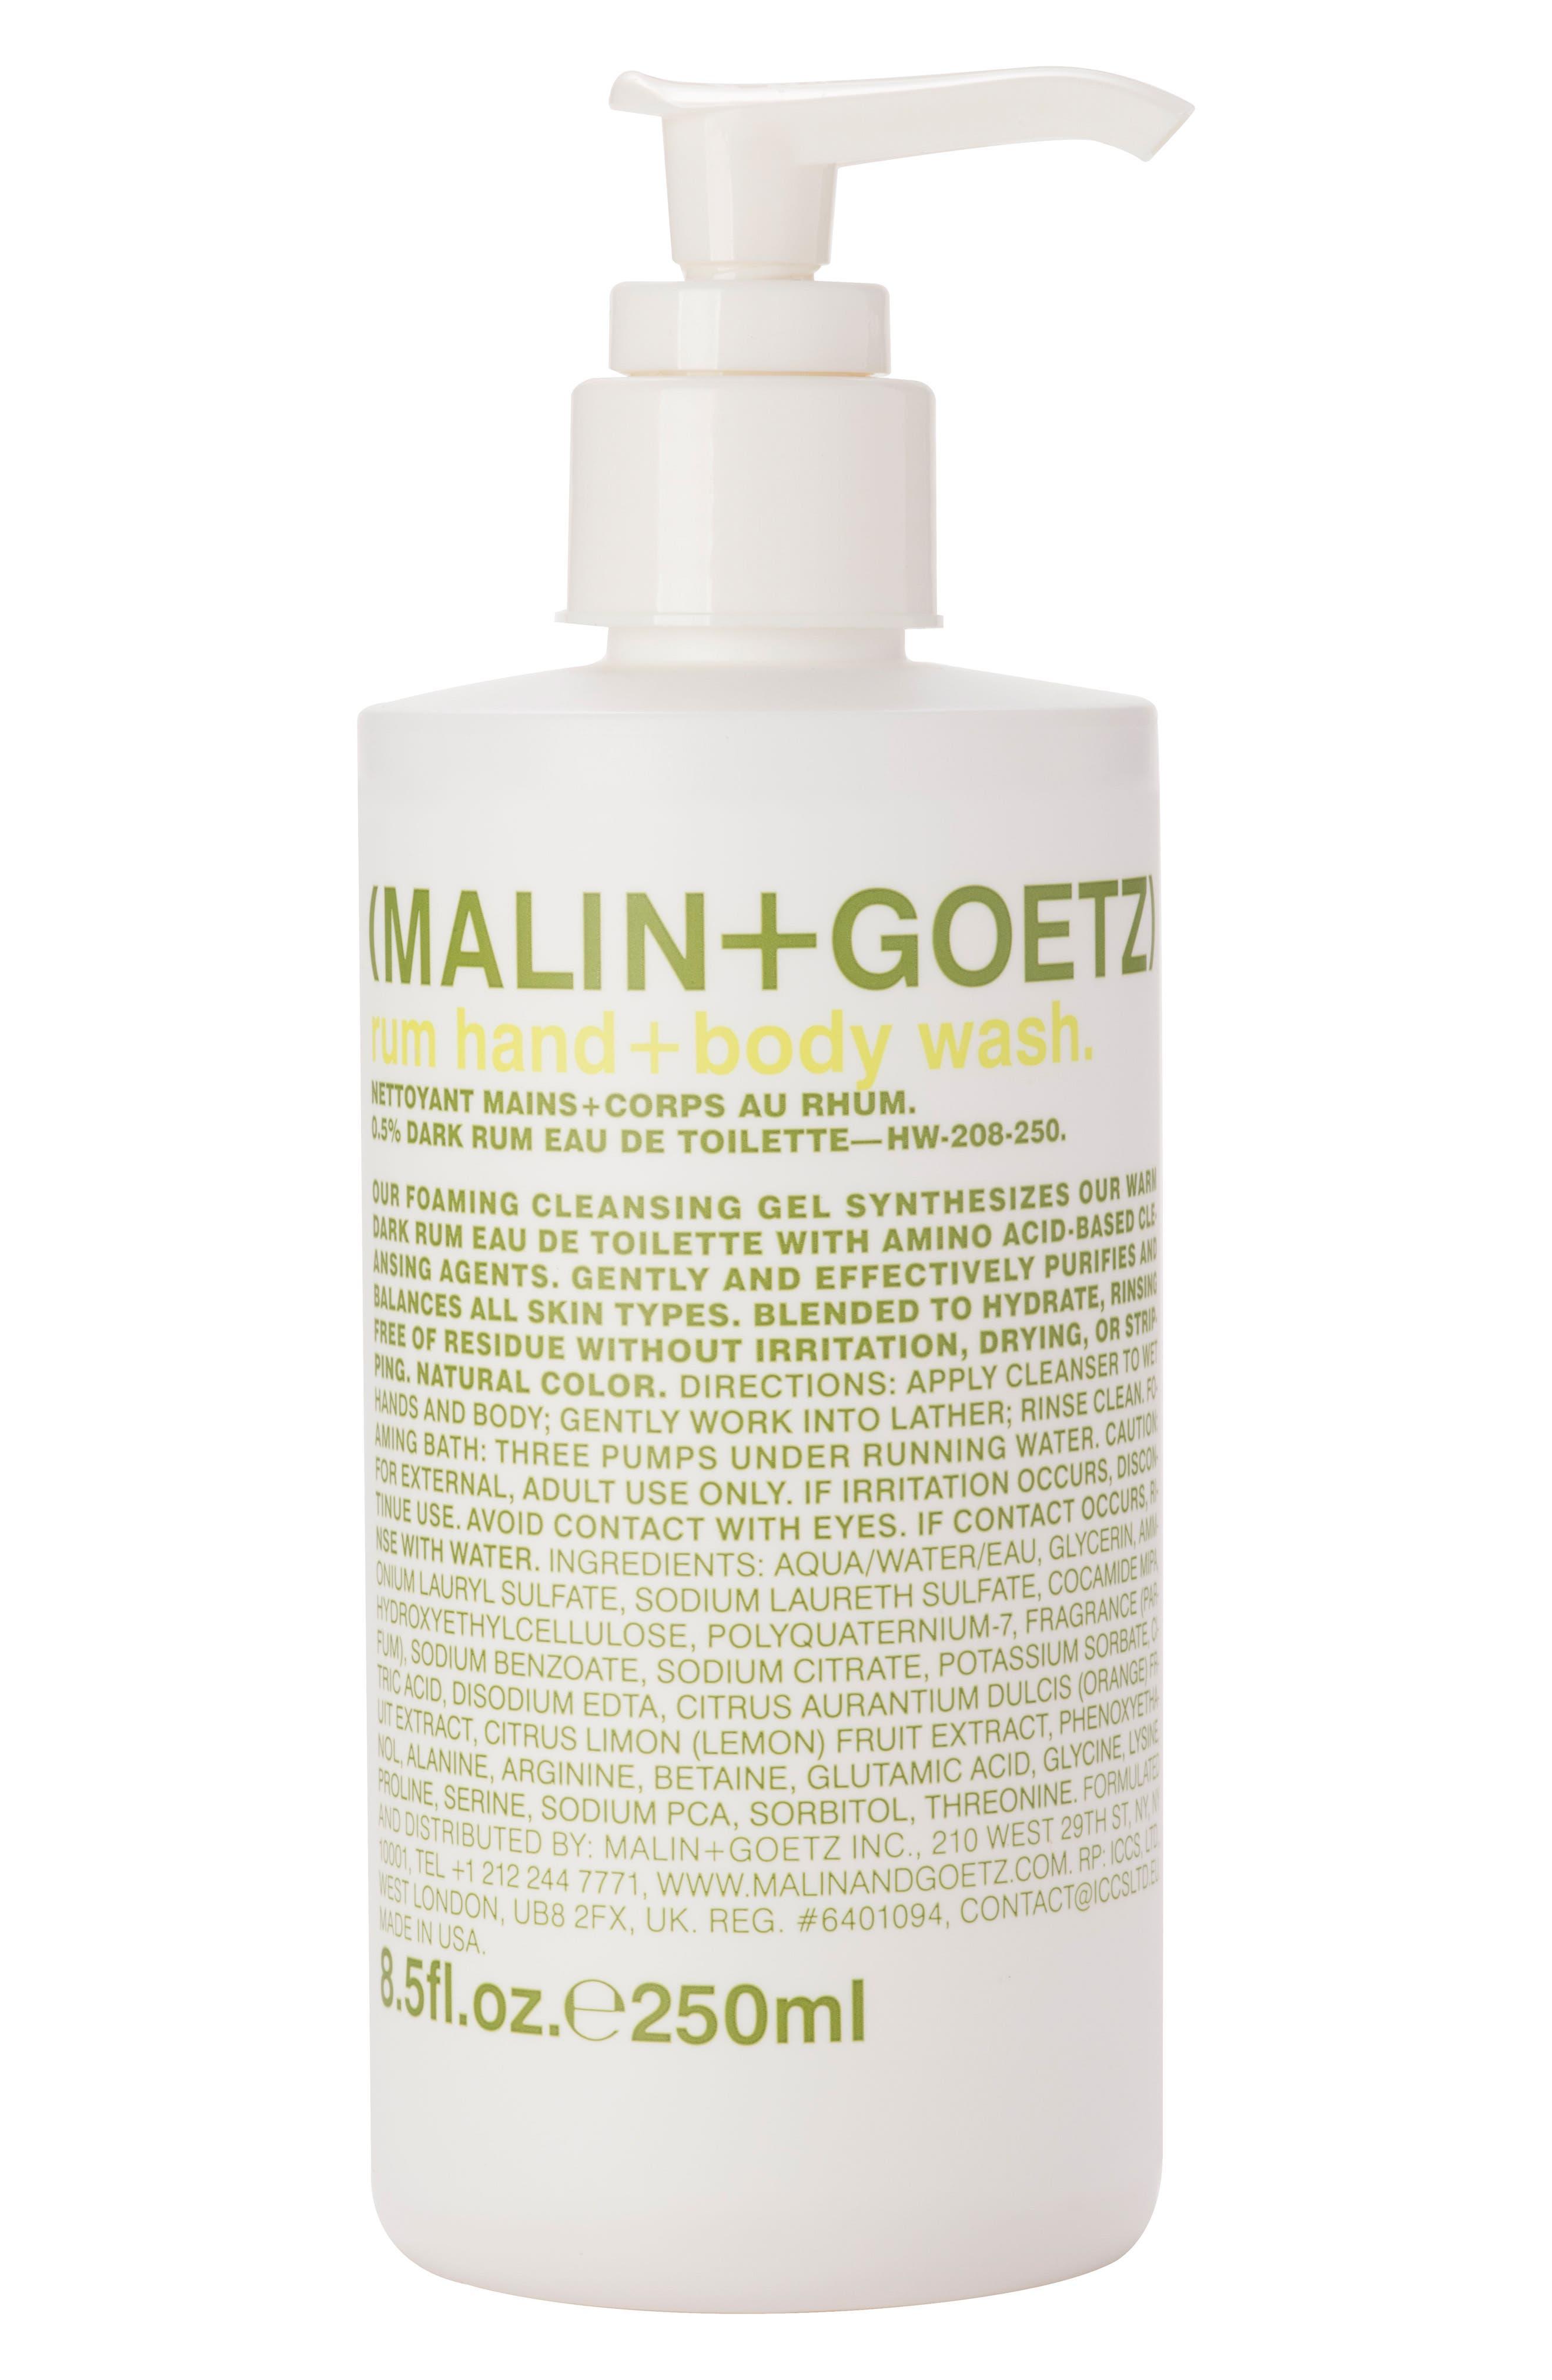 MALIN+GOETZ Rum Hand & Body Wash with Pump